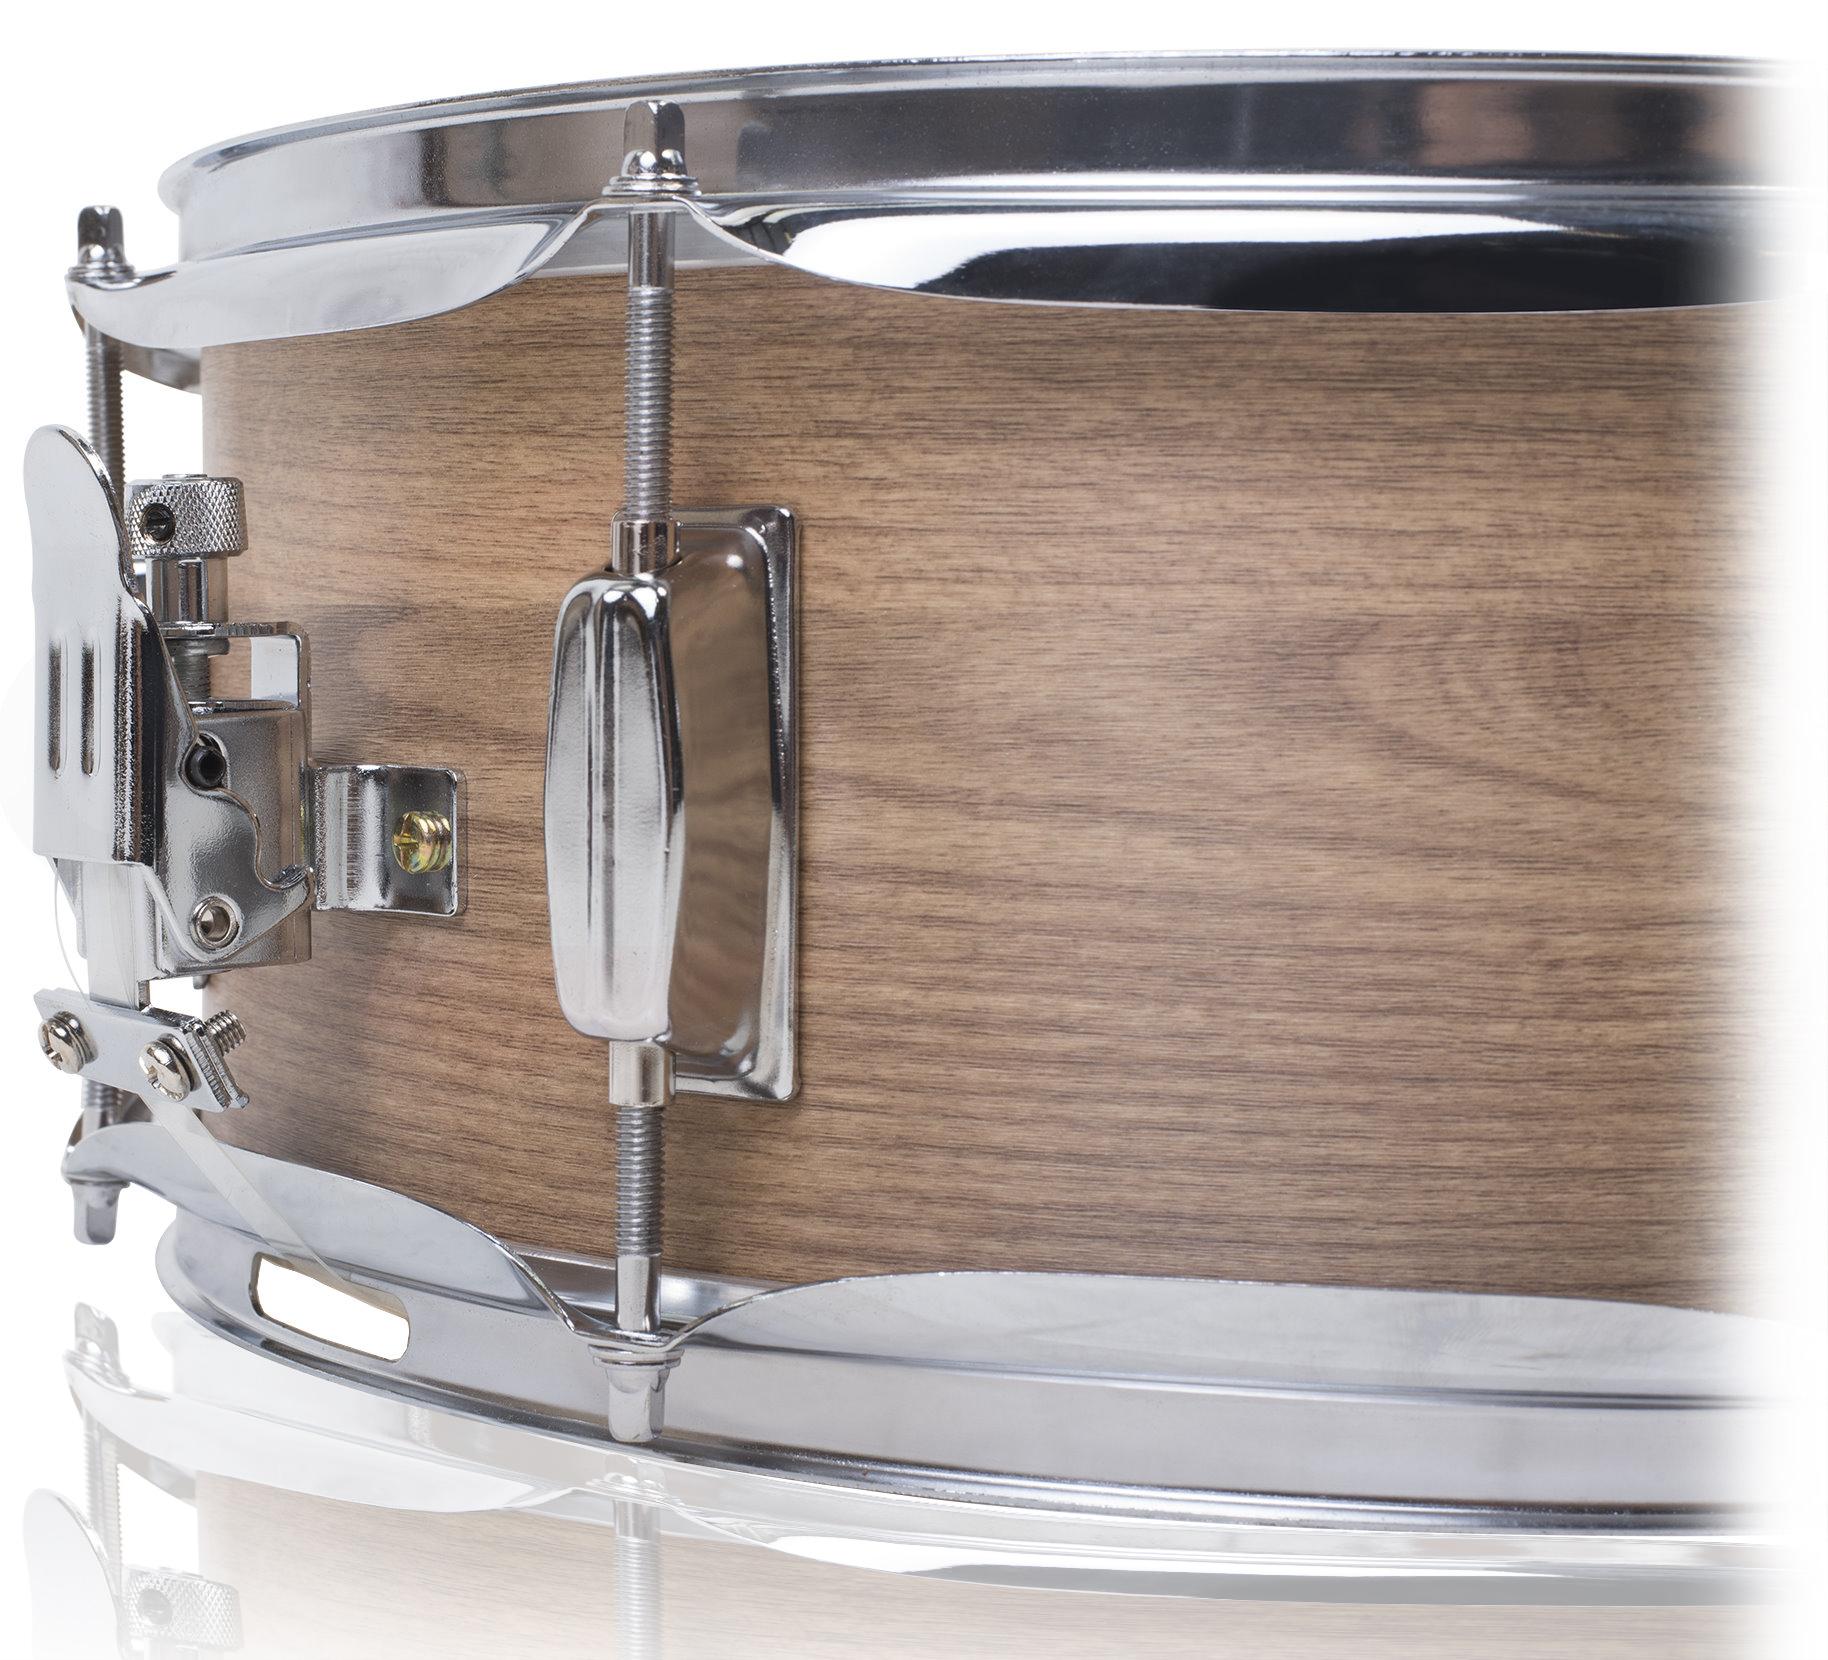 snare drum by griffin oak wood 14x5 5 poplar shell percussion kit set key 14 609132684074 ebay. Black Bedroom Furniture Sets. Home Design Ideas